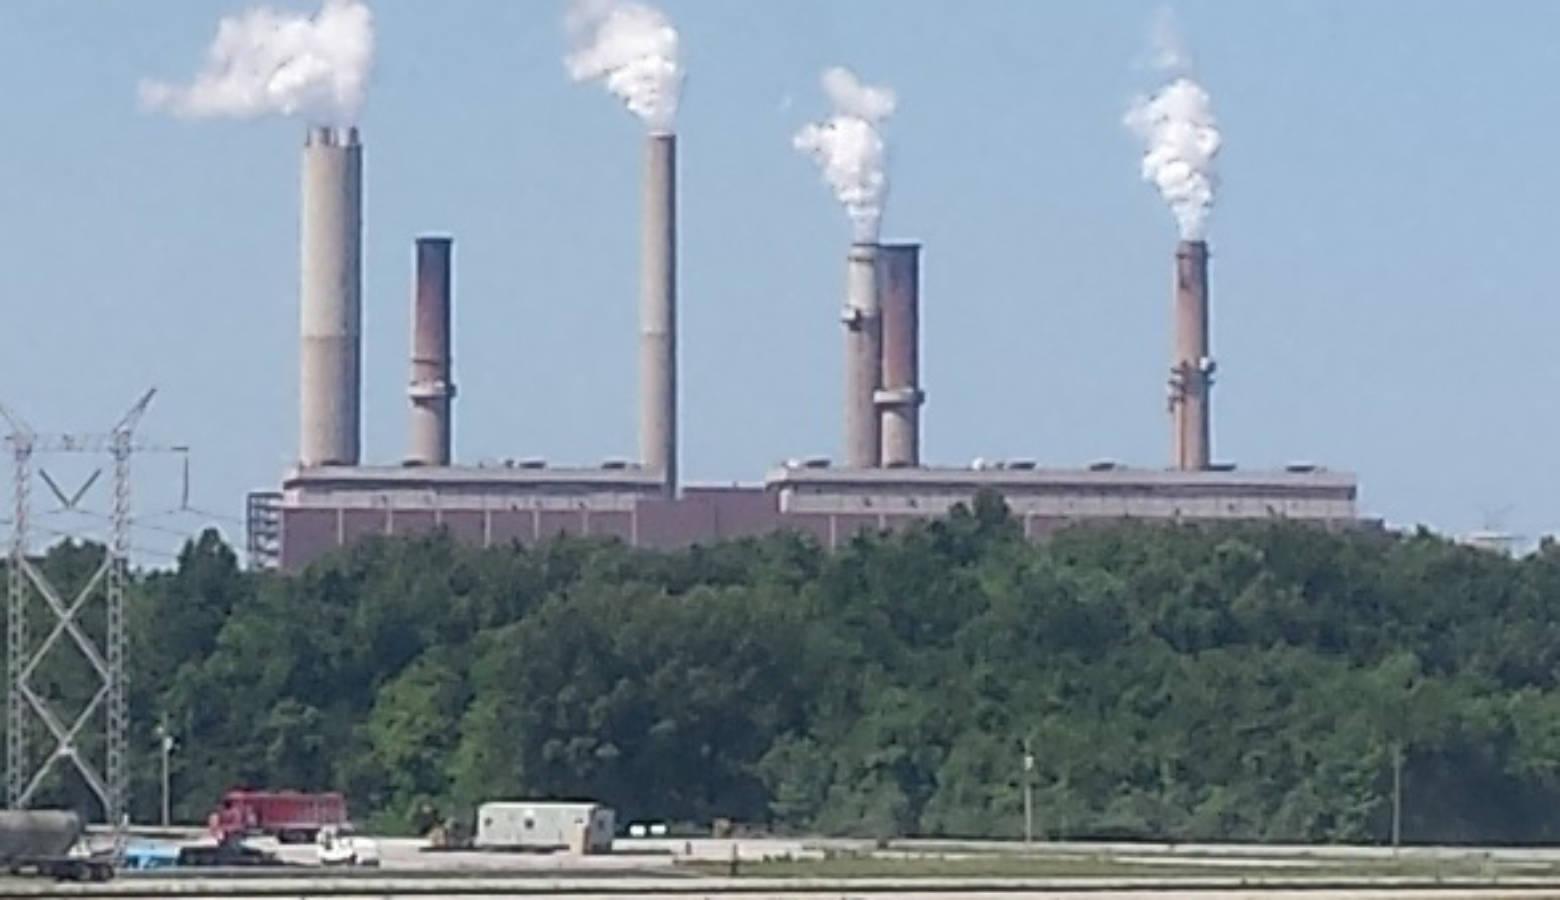 Duke Energy's Gibson generating station, 2016 (Wikimedia Commons)